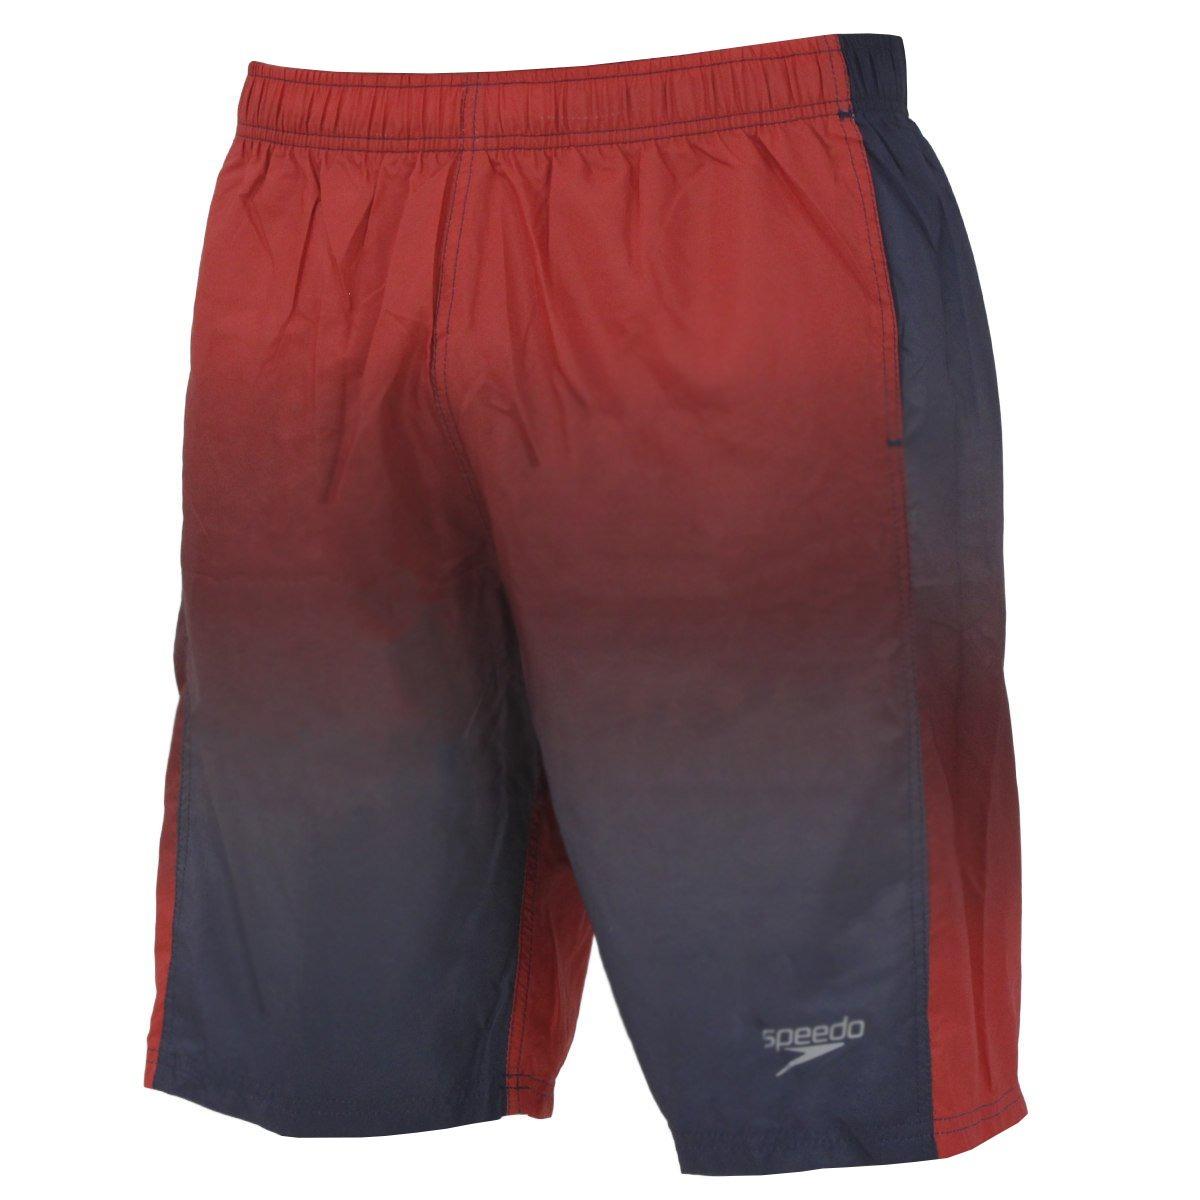 8c45c2484 bermuda masculina speedo reversed shorts academia treino. Carregando zoom.